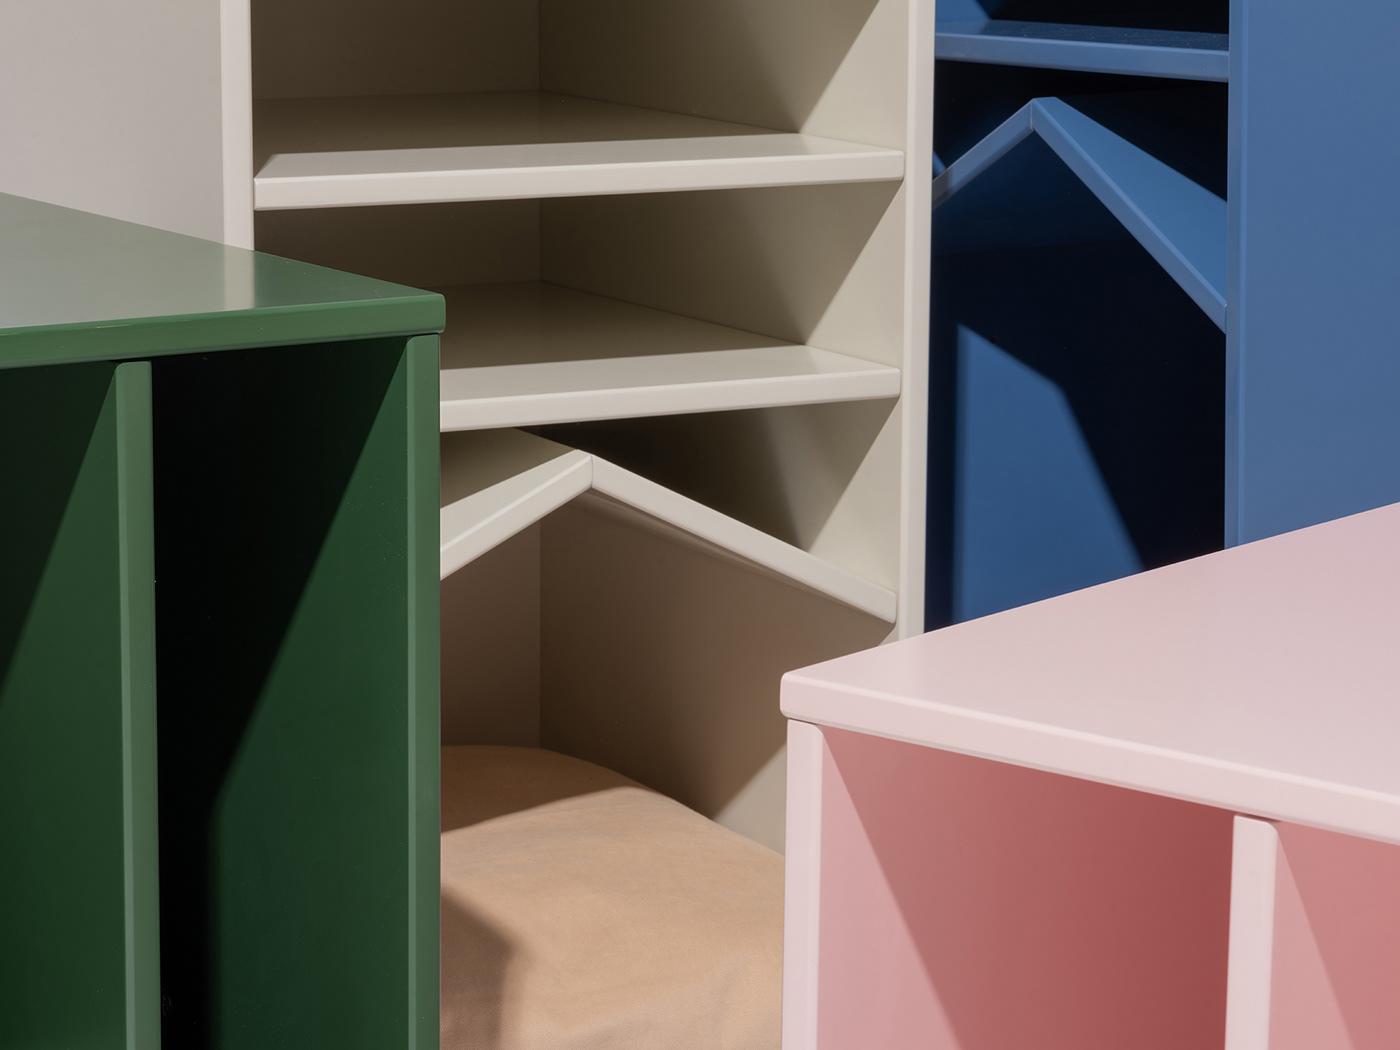 Image may contain: wall, indoor and box